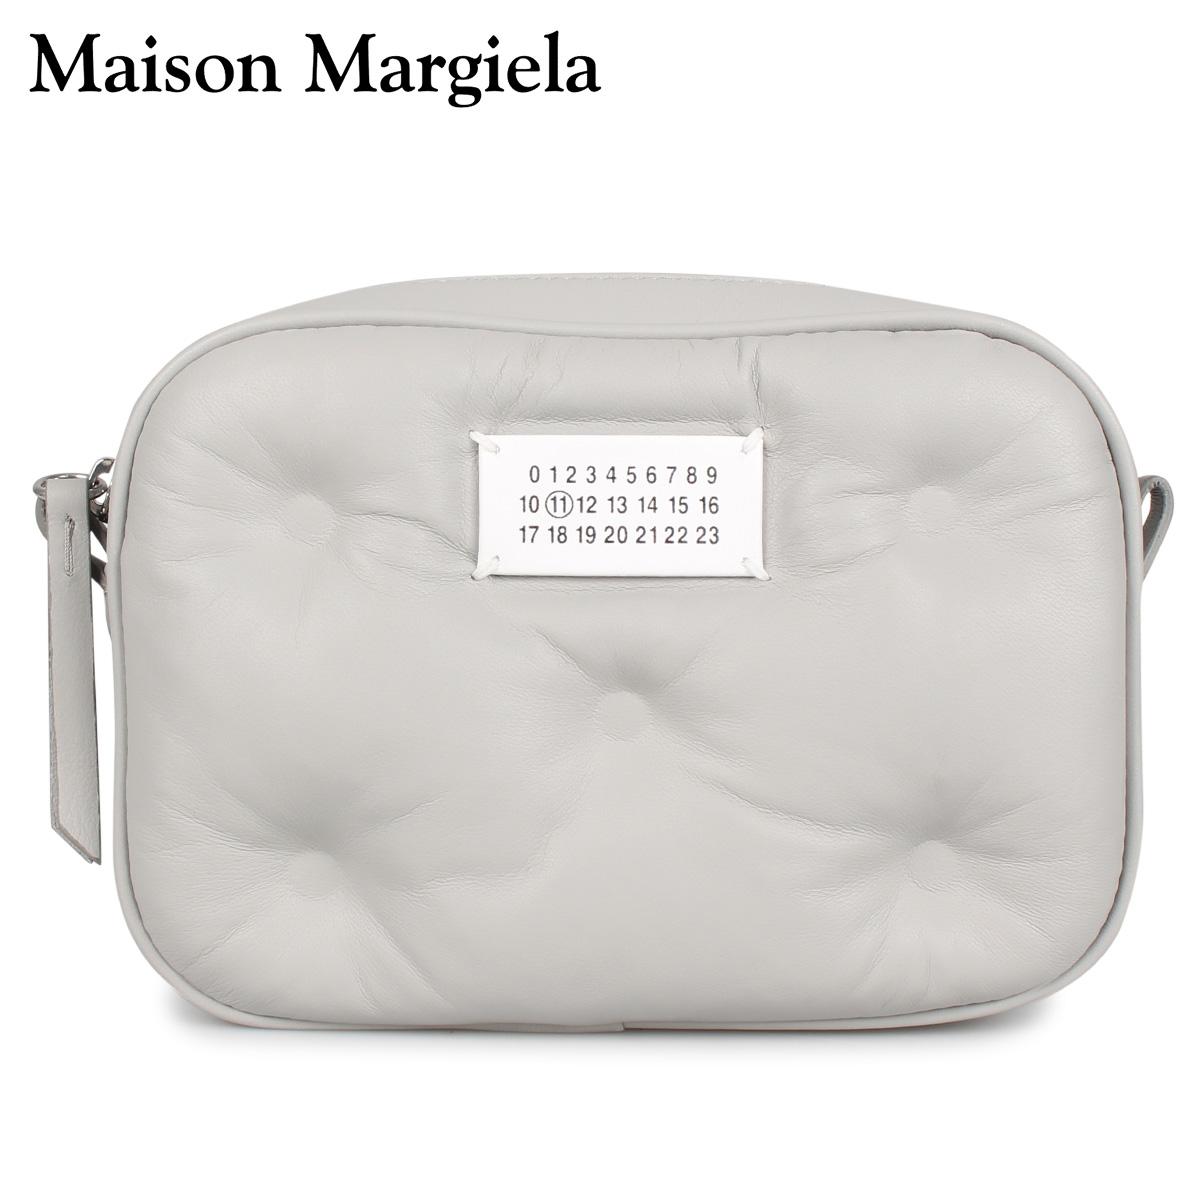 MAISON MARGIELA メゾンマルジェラ バッグ ショルダーバッグ ポーチ レディース GLAM SLAM CROSS BODY BAG グレー S56WG0108 [4/15 新入荷]